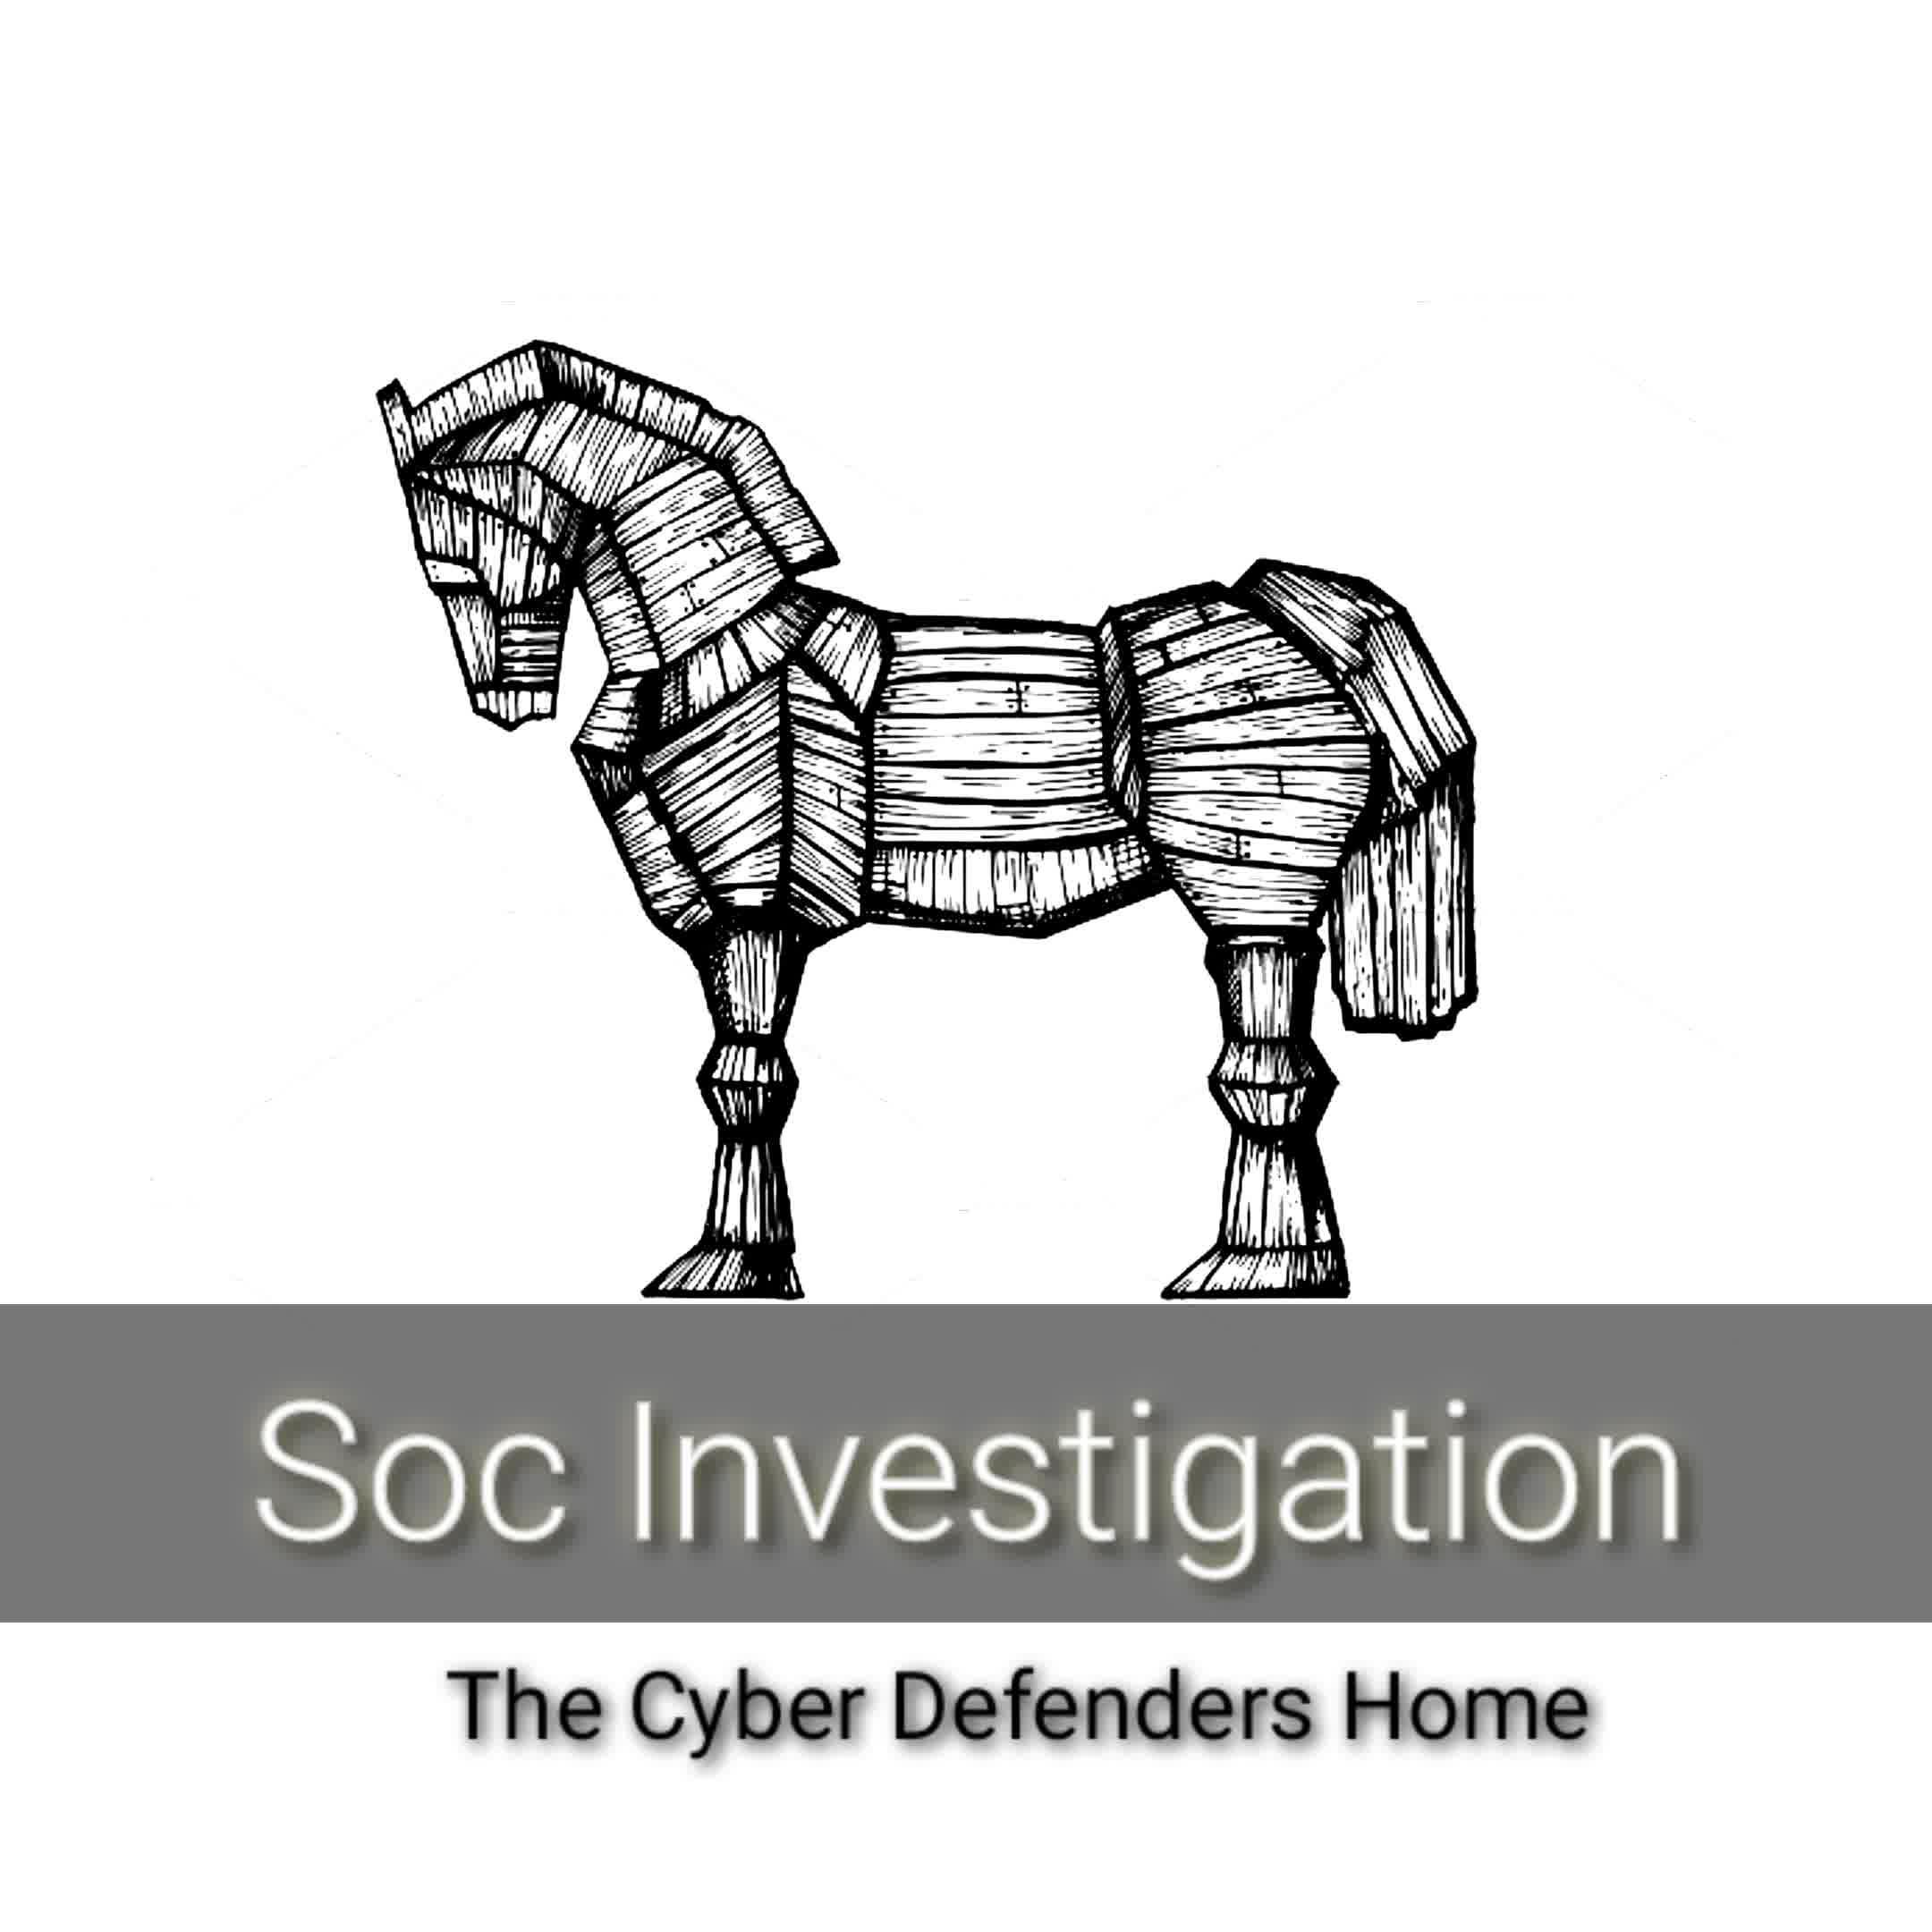 Soc Investigation